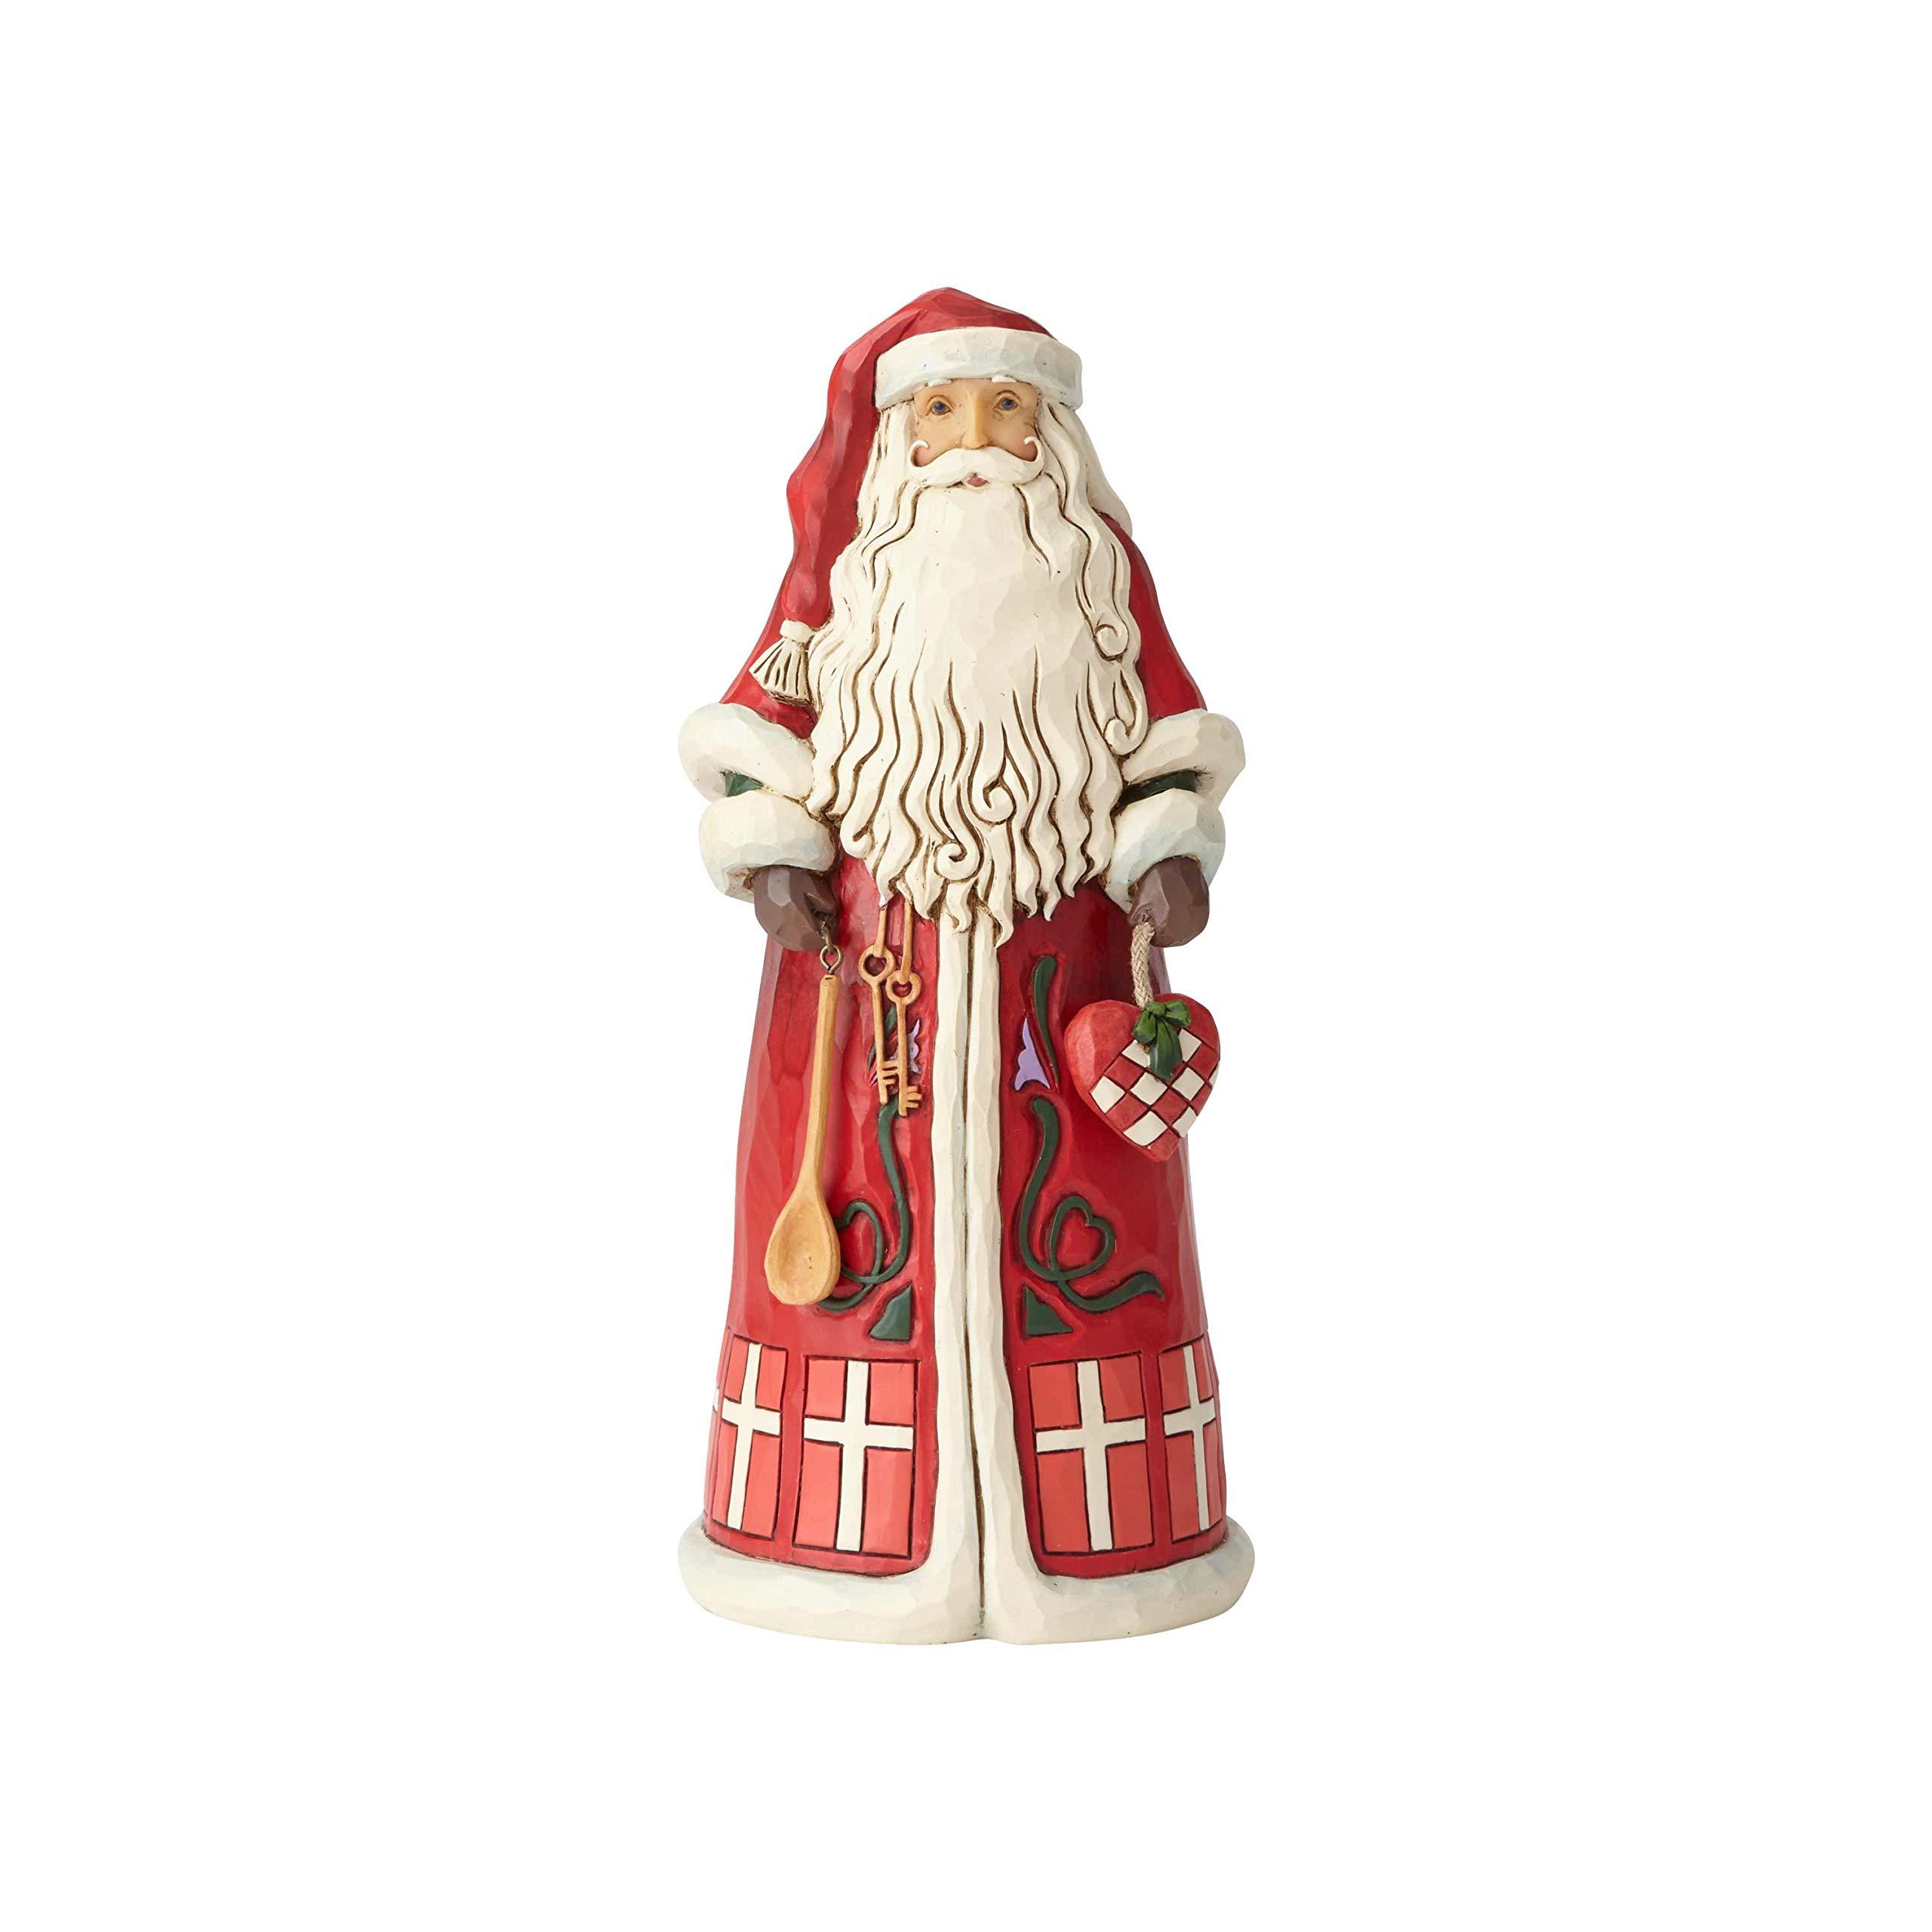 "Enesco Jim Shore Heartwood Creek Danish Santa Around The World Figurine, 7"", Multicolor"